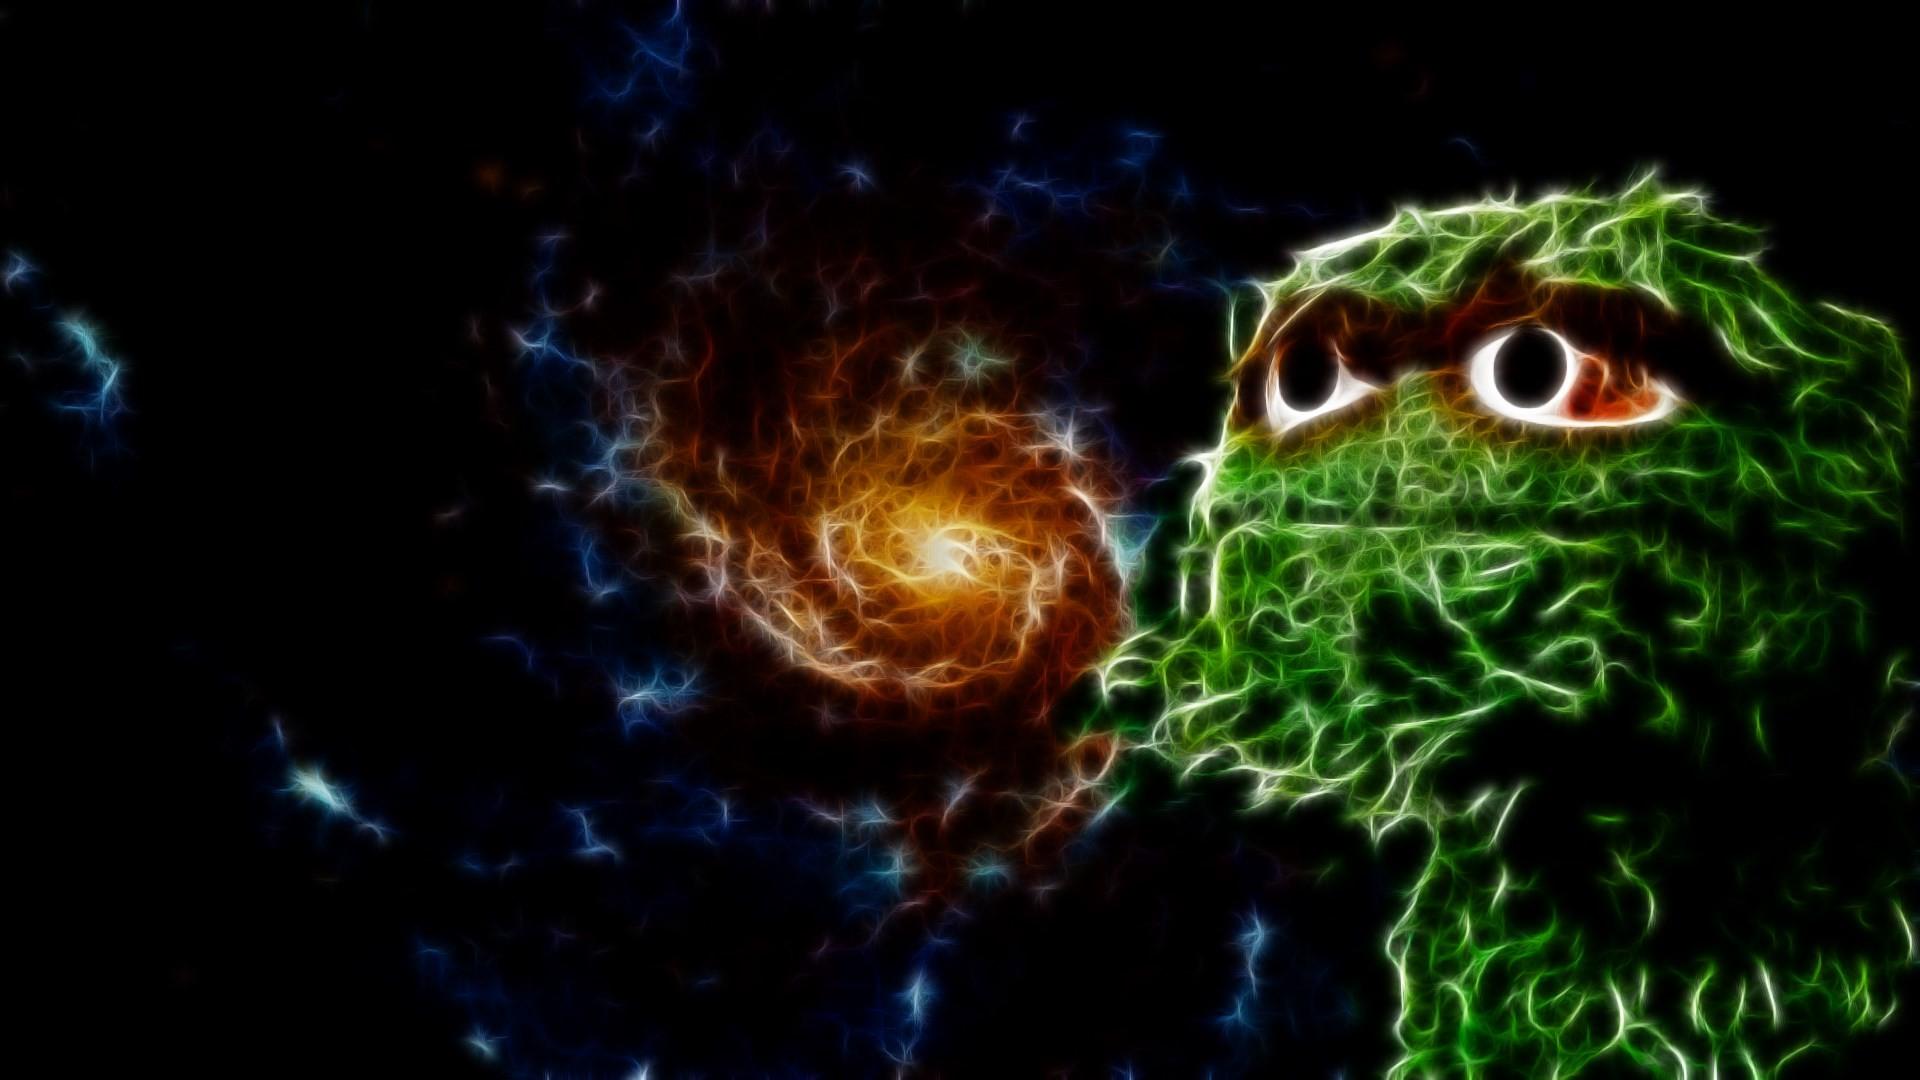 Sesame Street Wallpaper (74+ Images